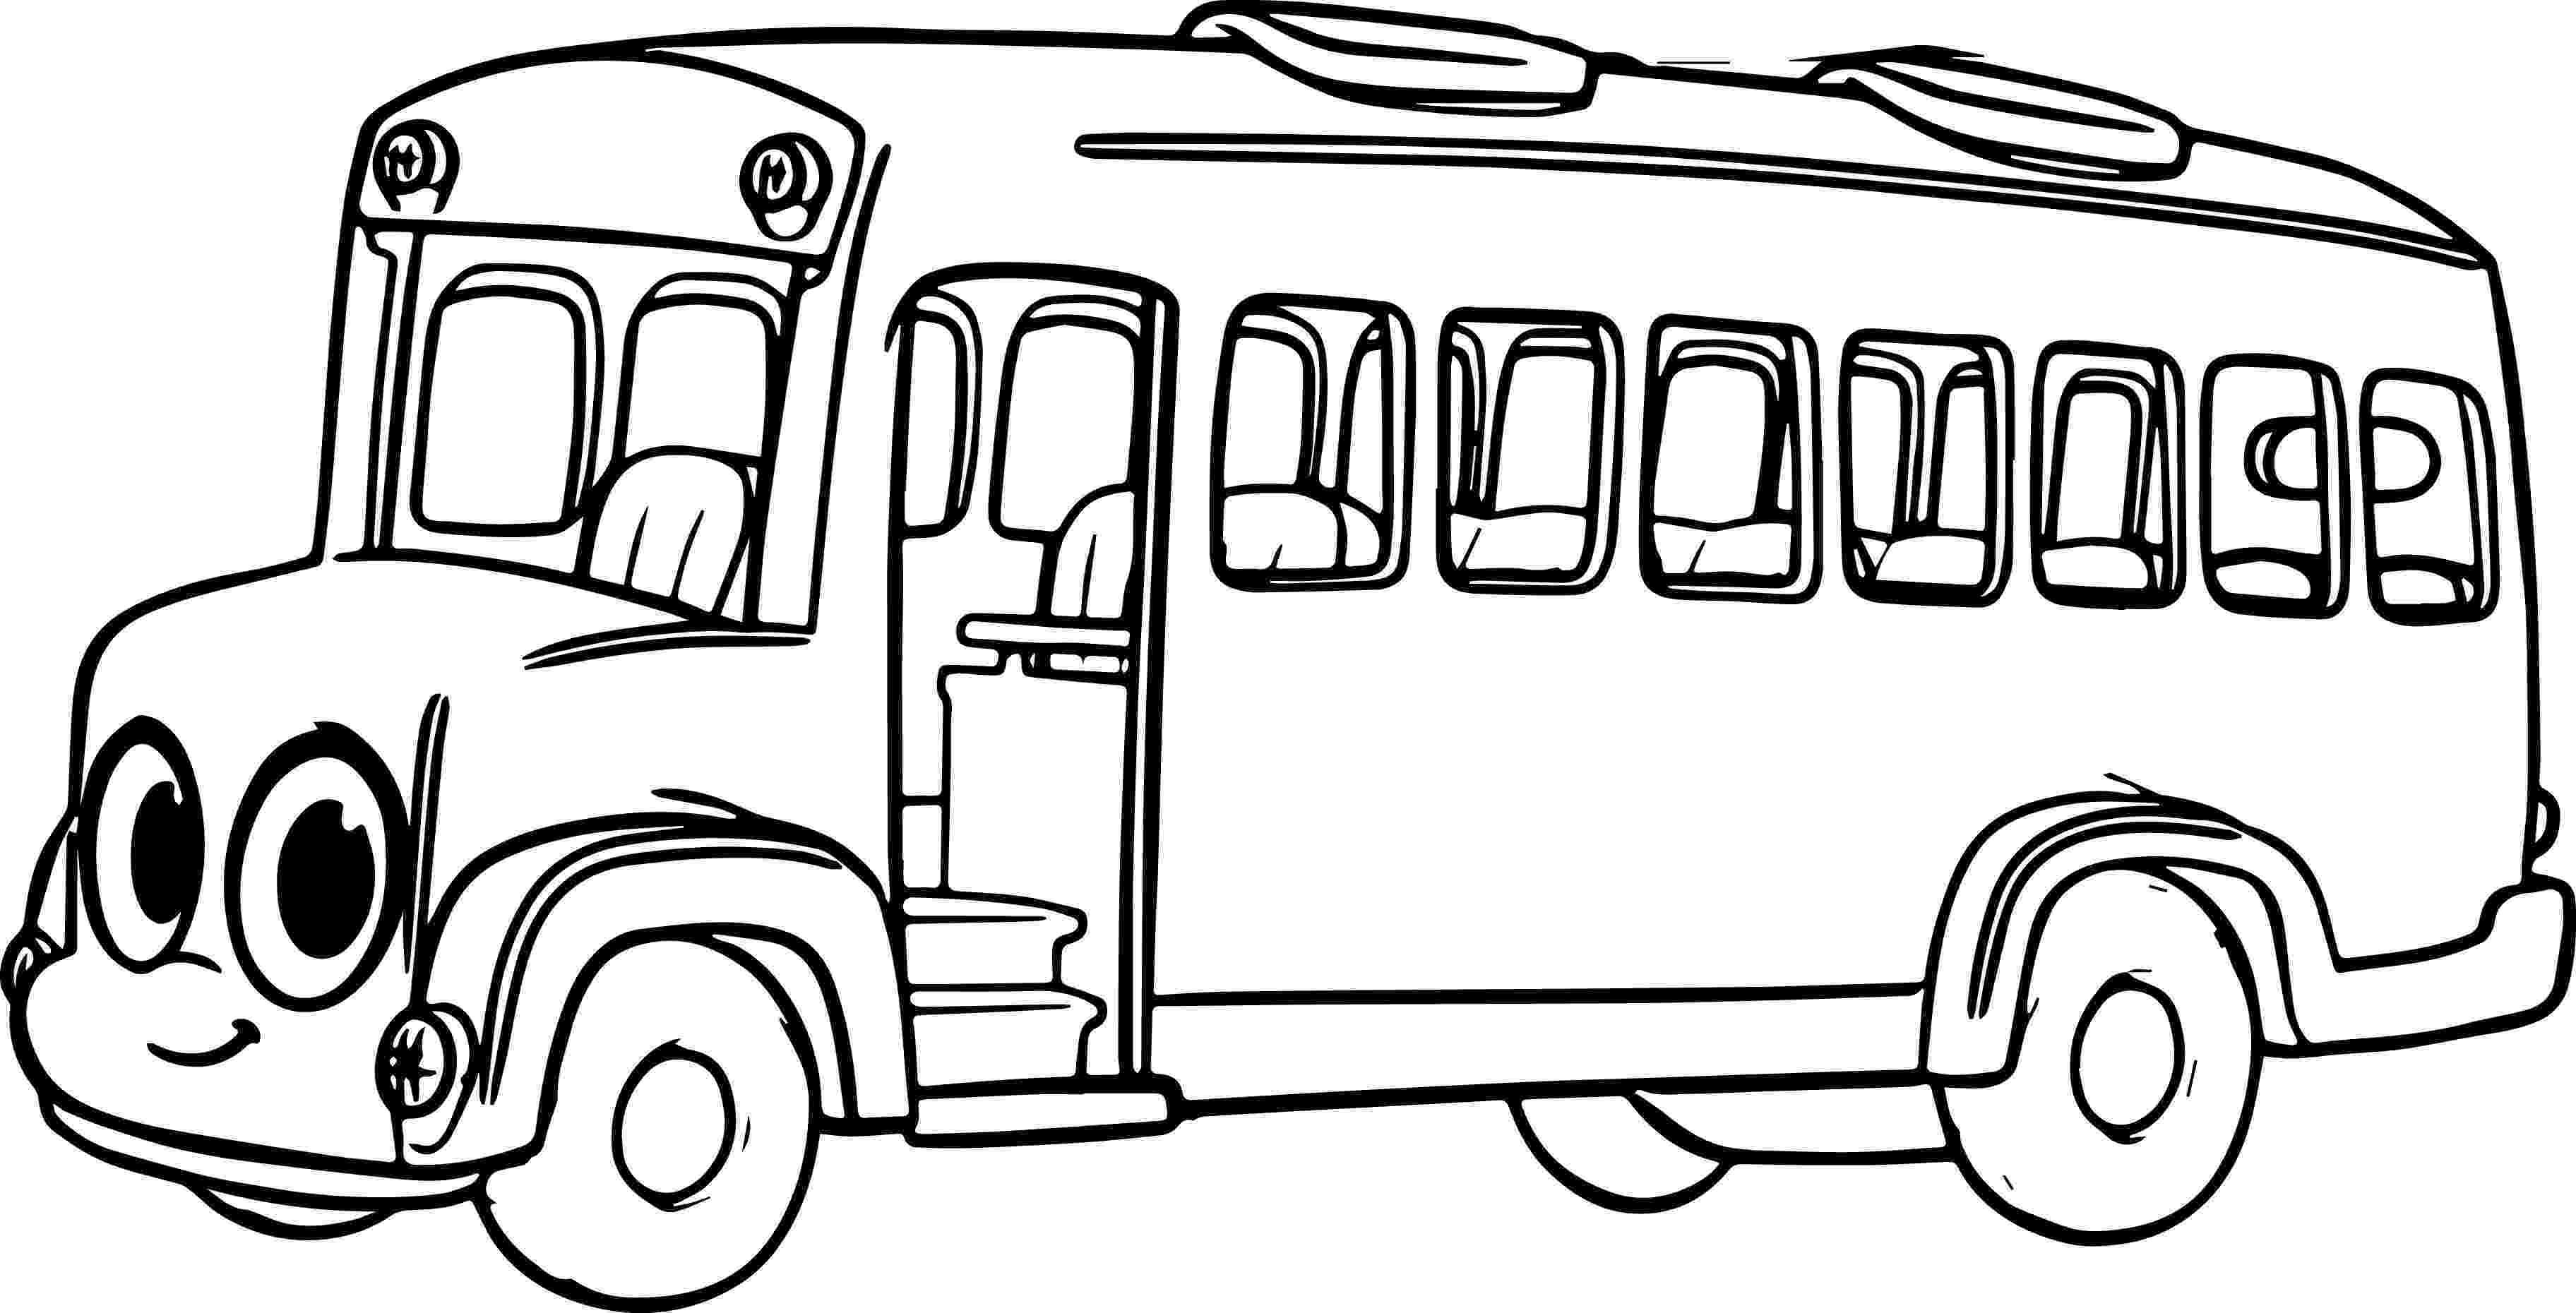 bus coloring pages renault agora ratp bus coloring page wecoloringpagecom pages coloring bus